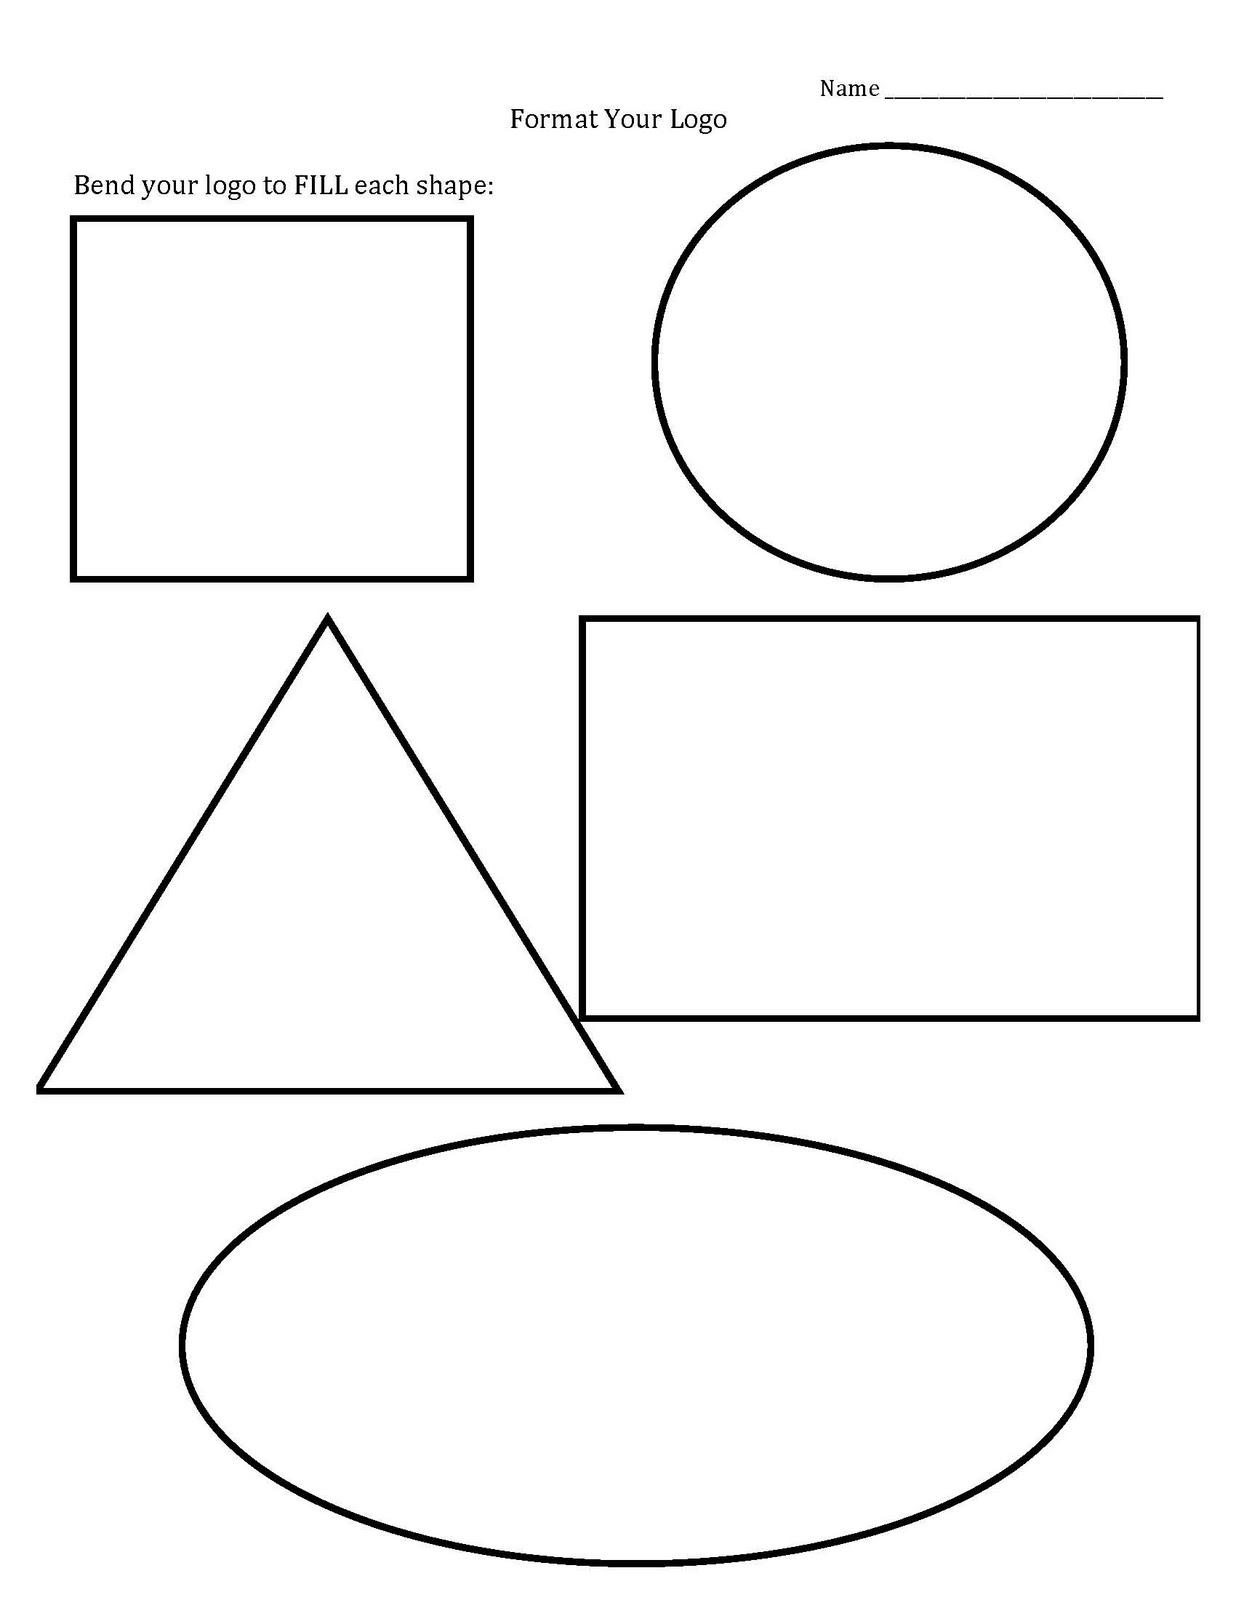 Organized Chaos Personal Logos 5th Grade